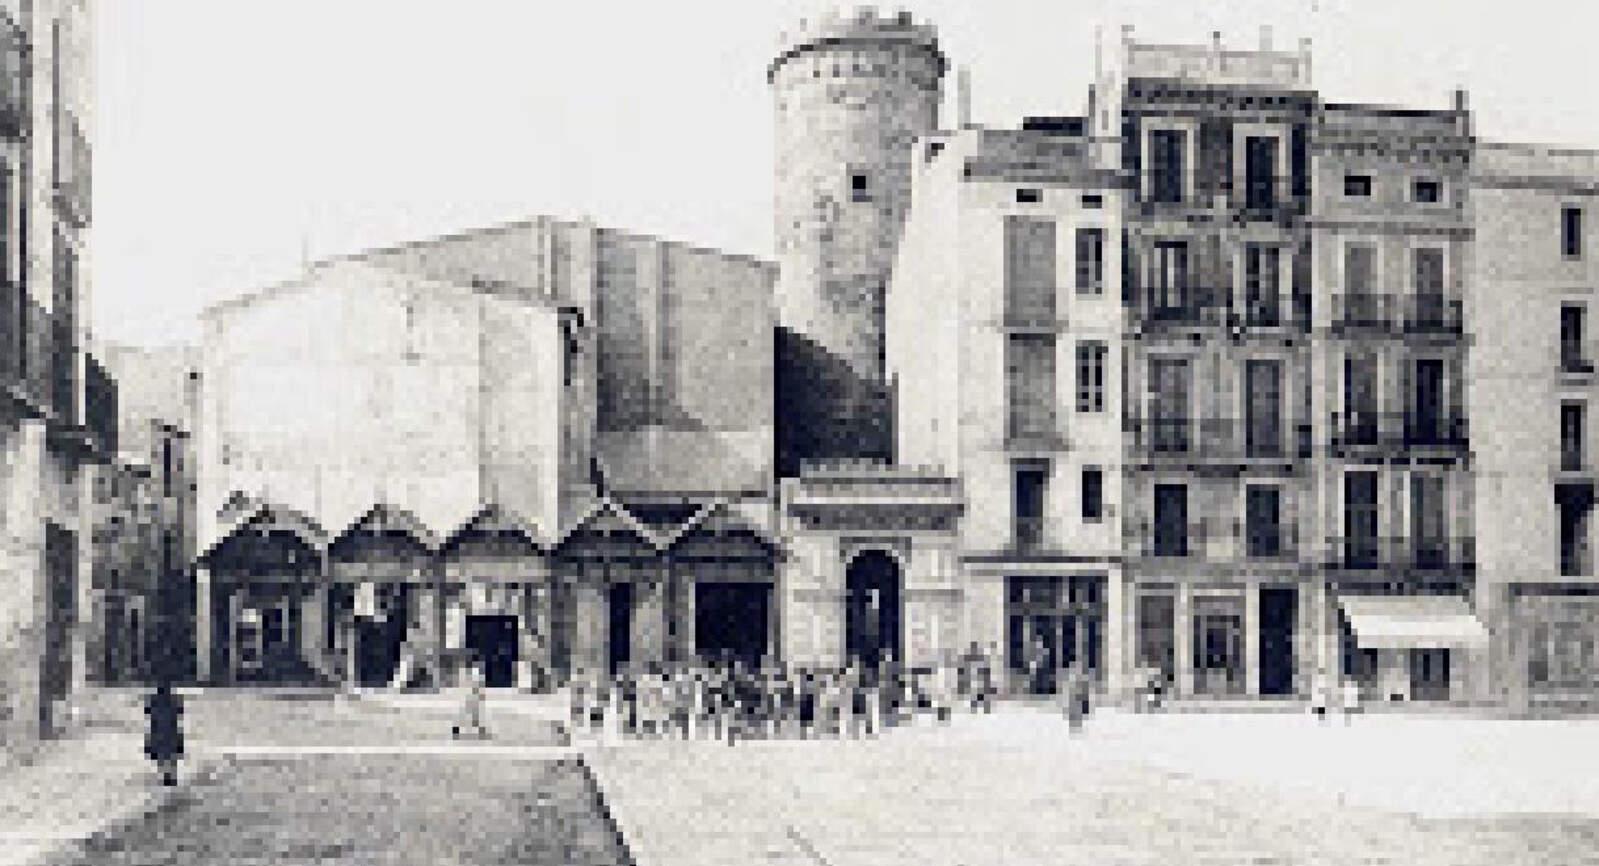 Espai on hi havia les cases del castell